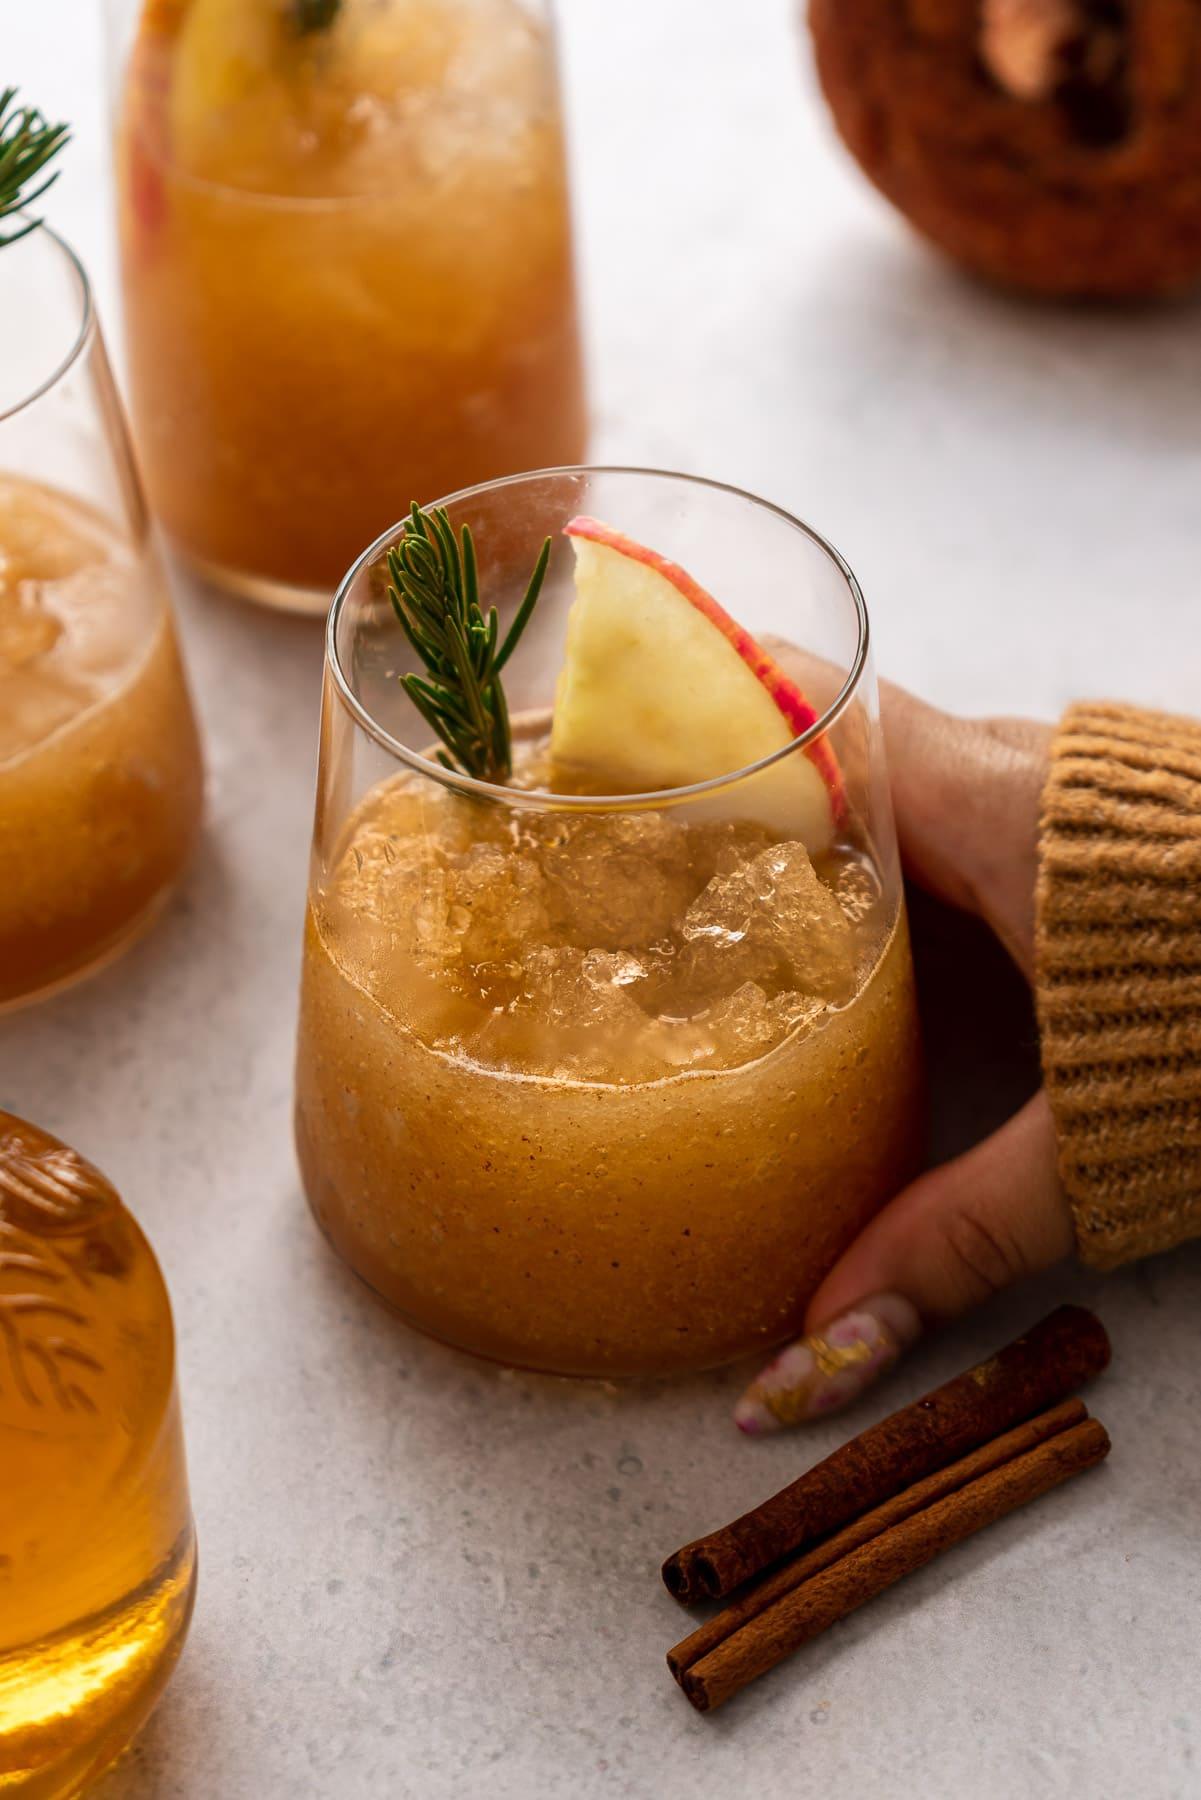 cozy hand holding a glass of apple cider slushie